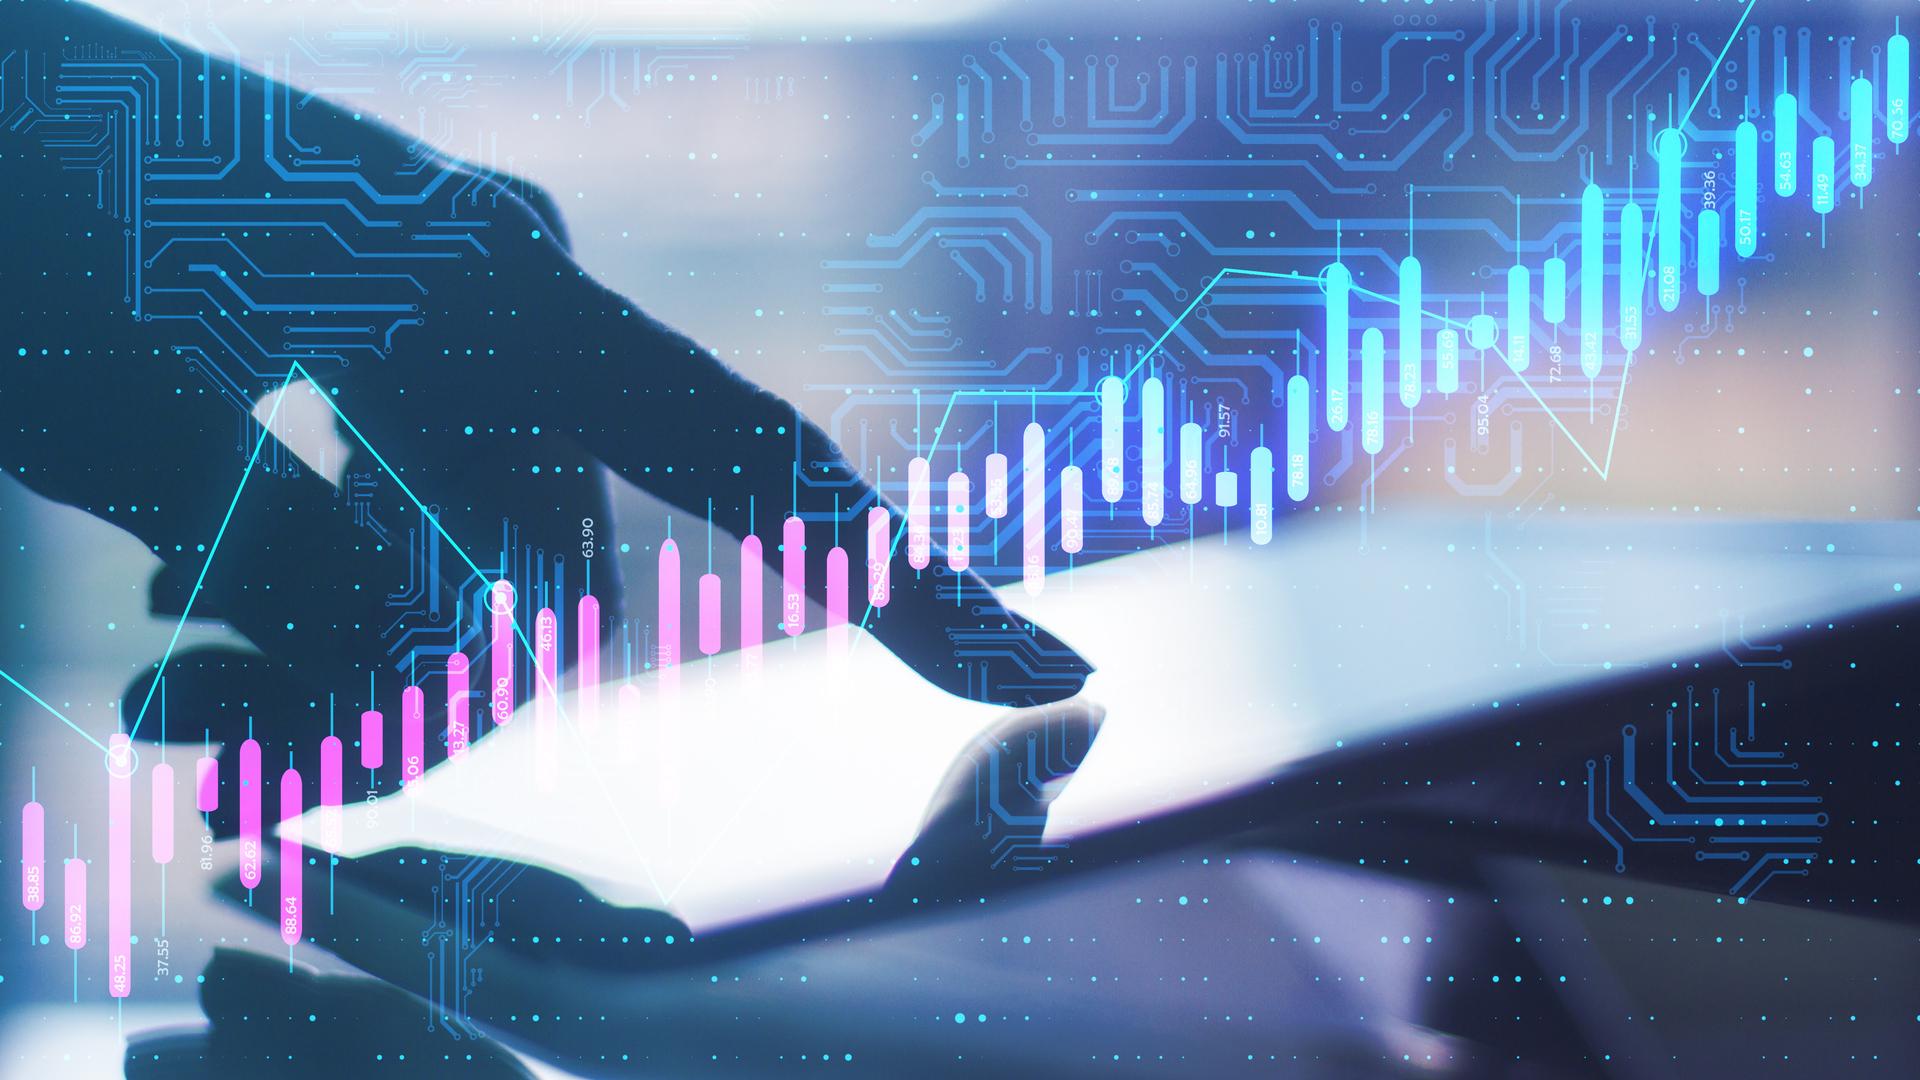 Senate report on digital assets released